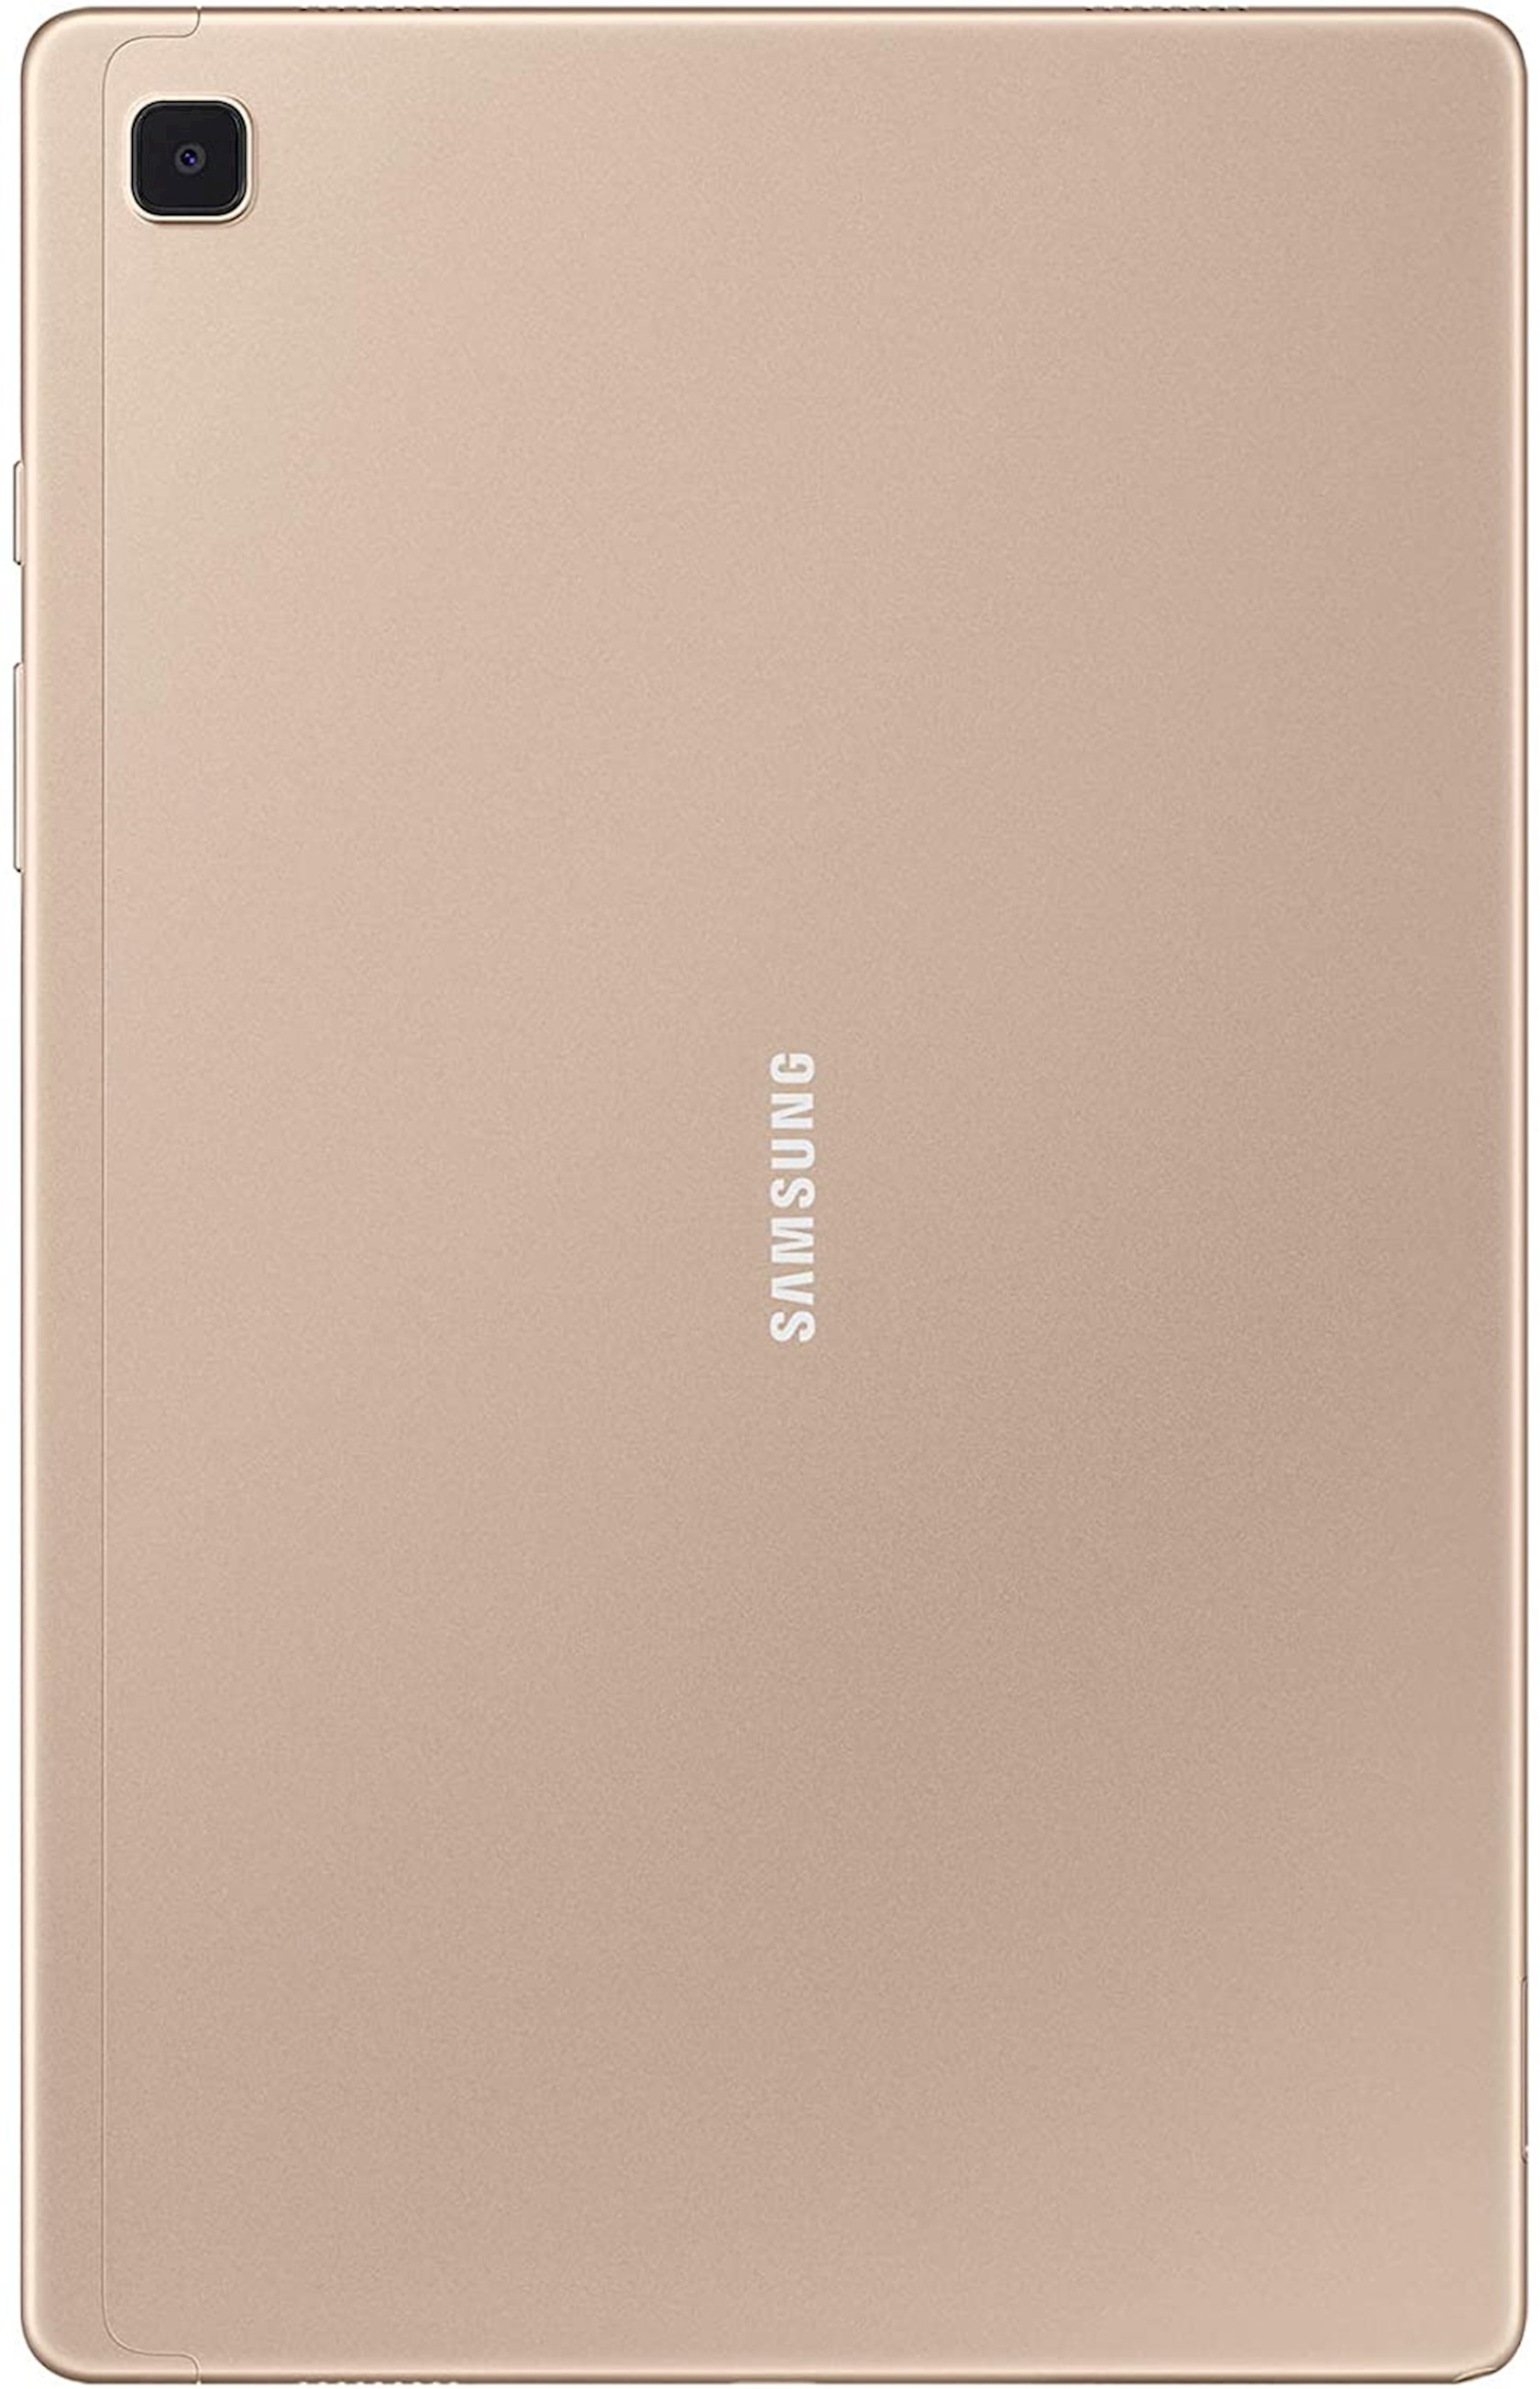 Planşet Samsung Galaxy Tab A7 10.4 2020 3GB/64GB Gold